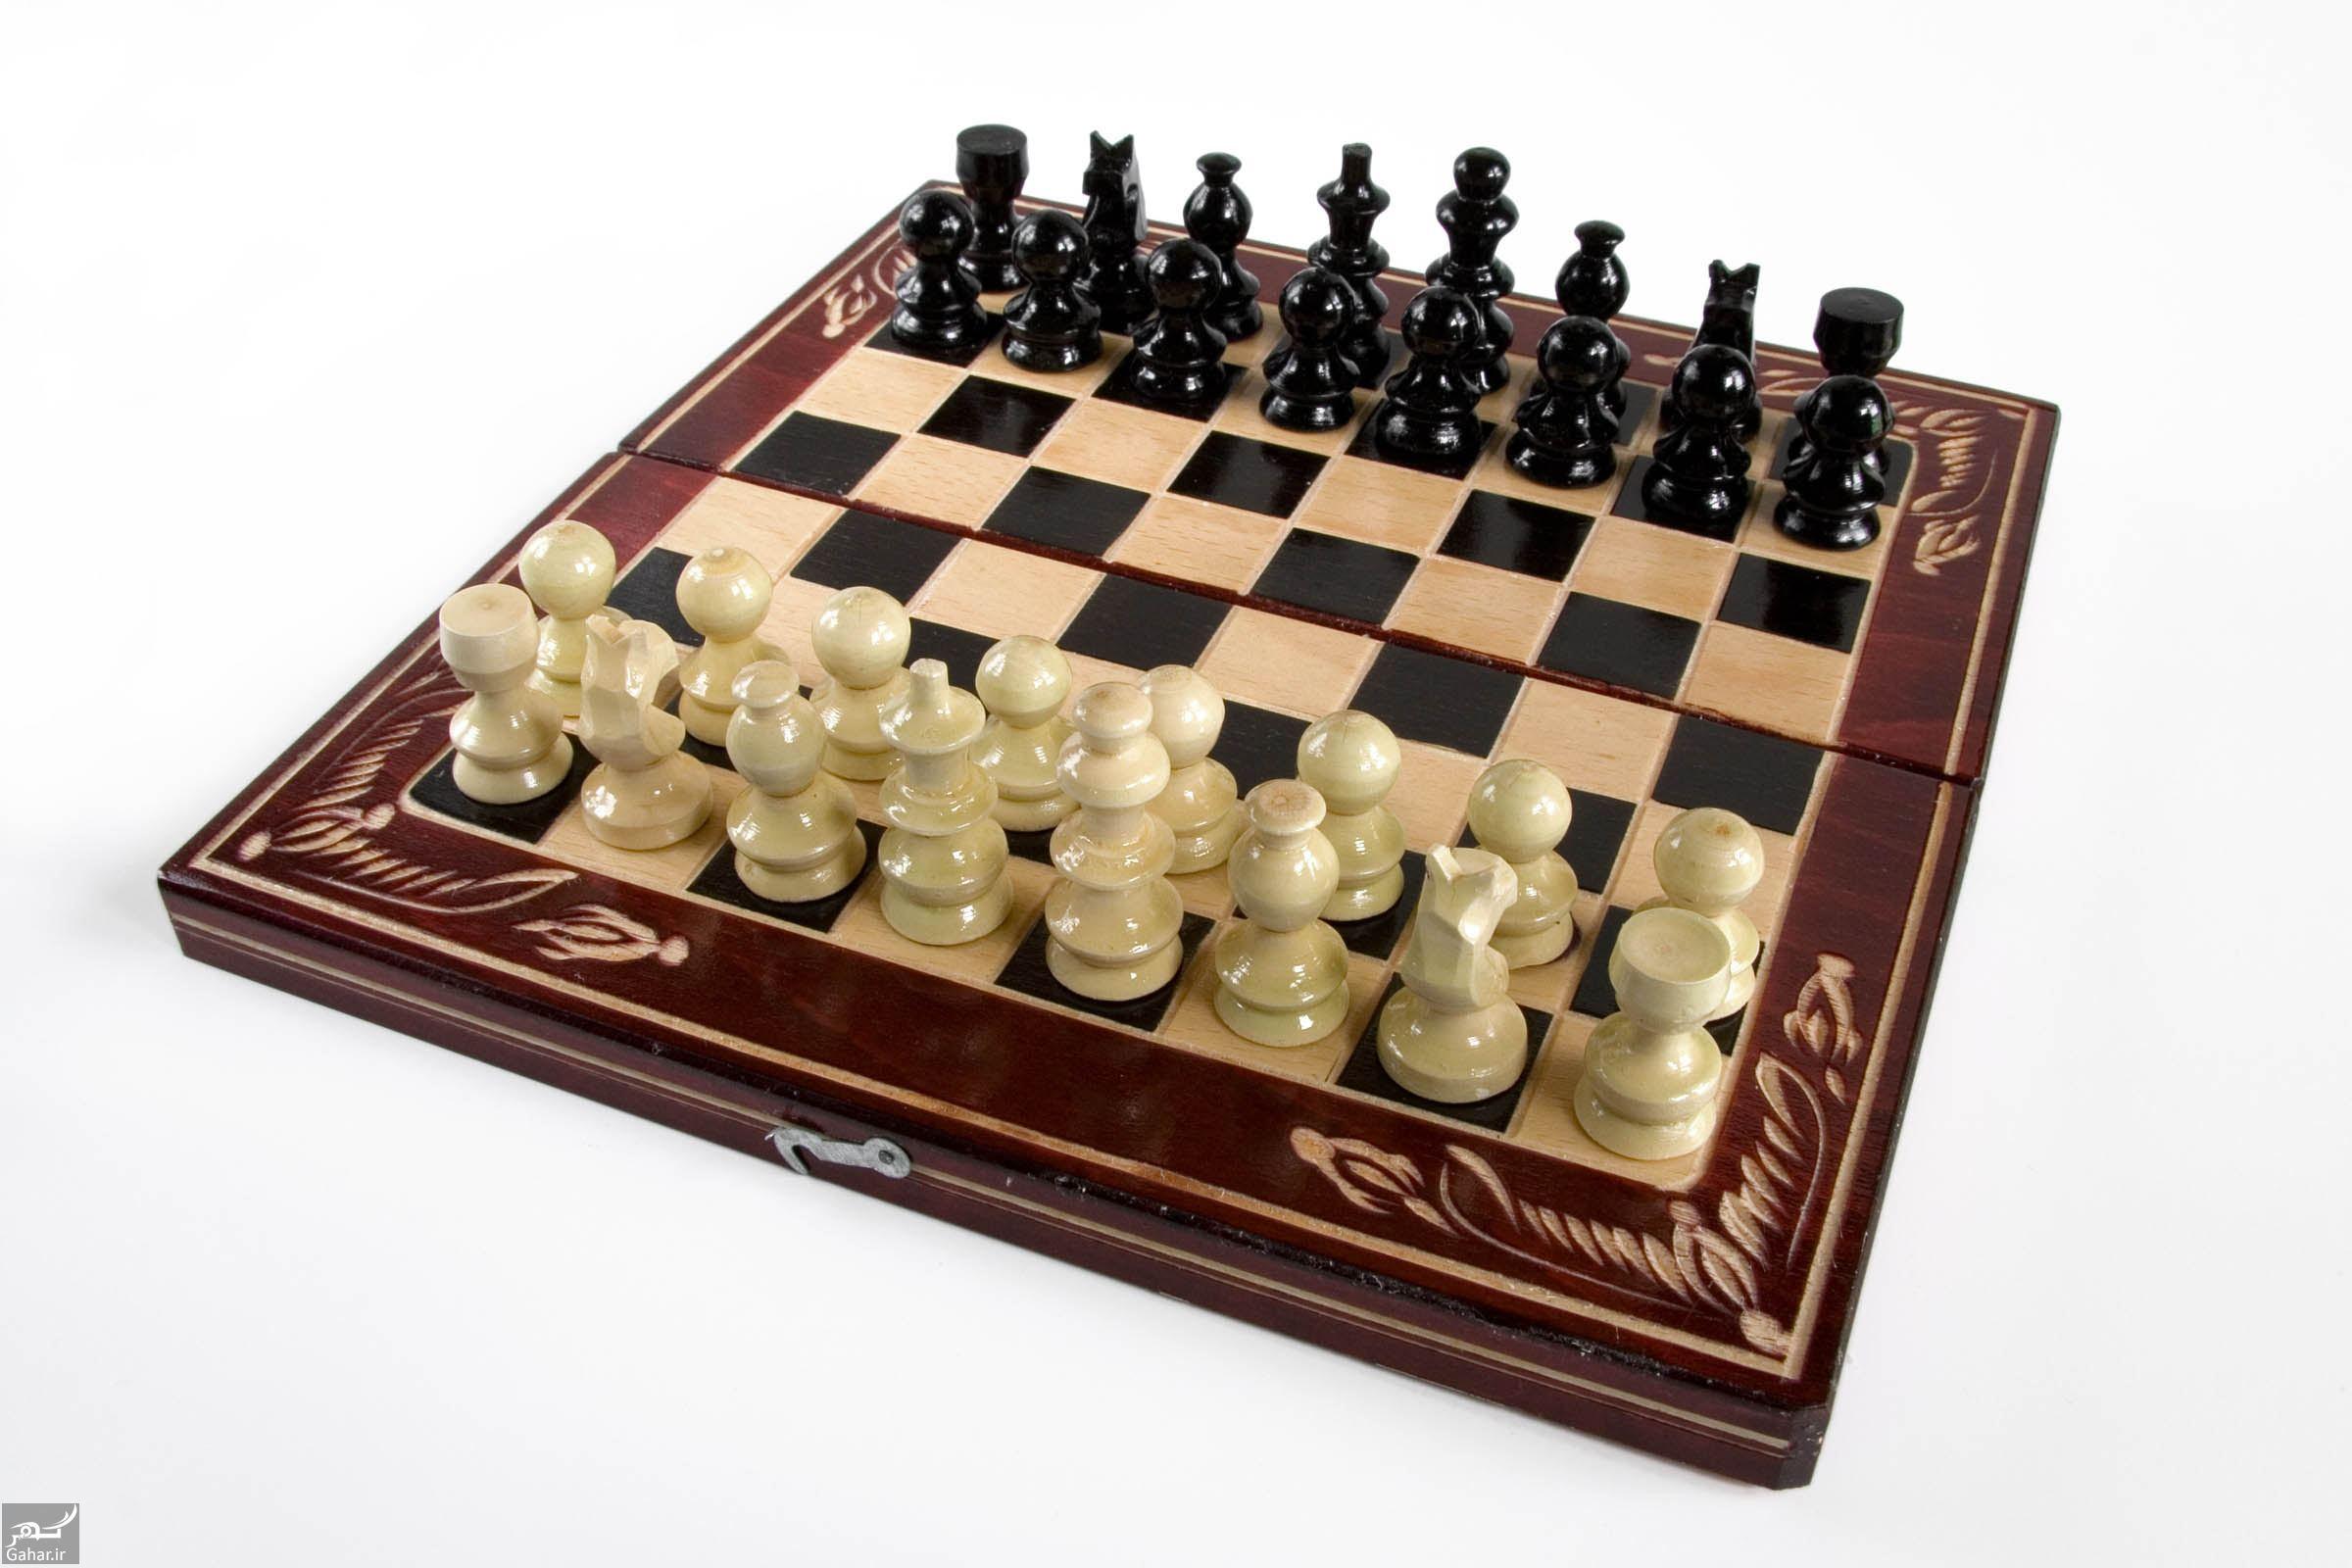 719491 Gahar ir ترفند های شطرنج برای حرفه ای شدن